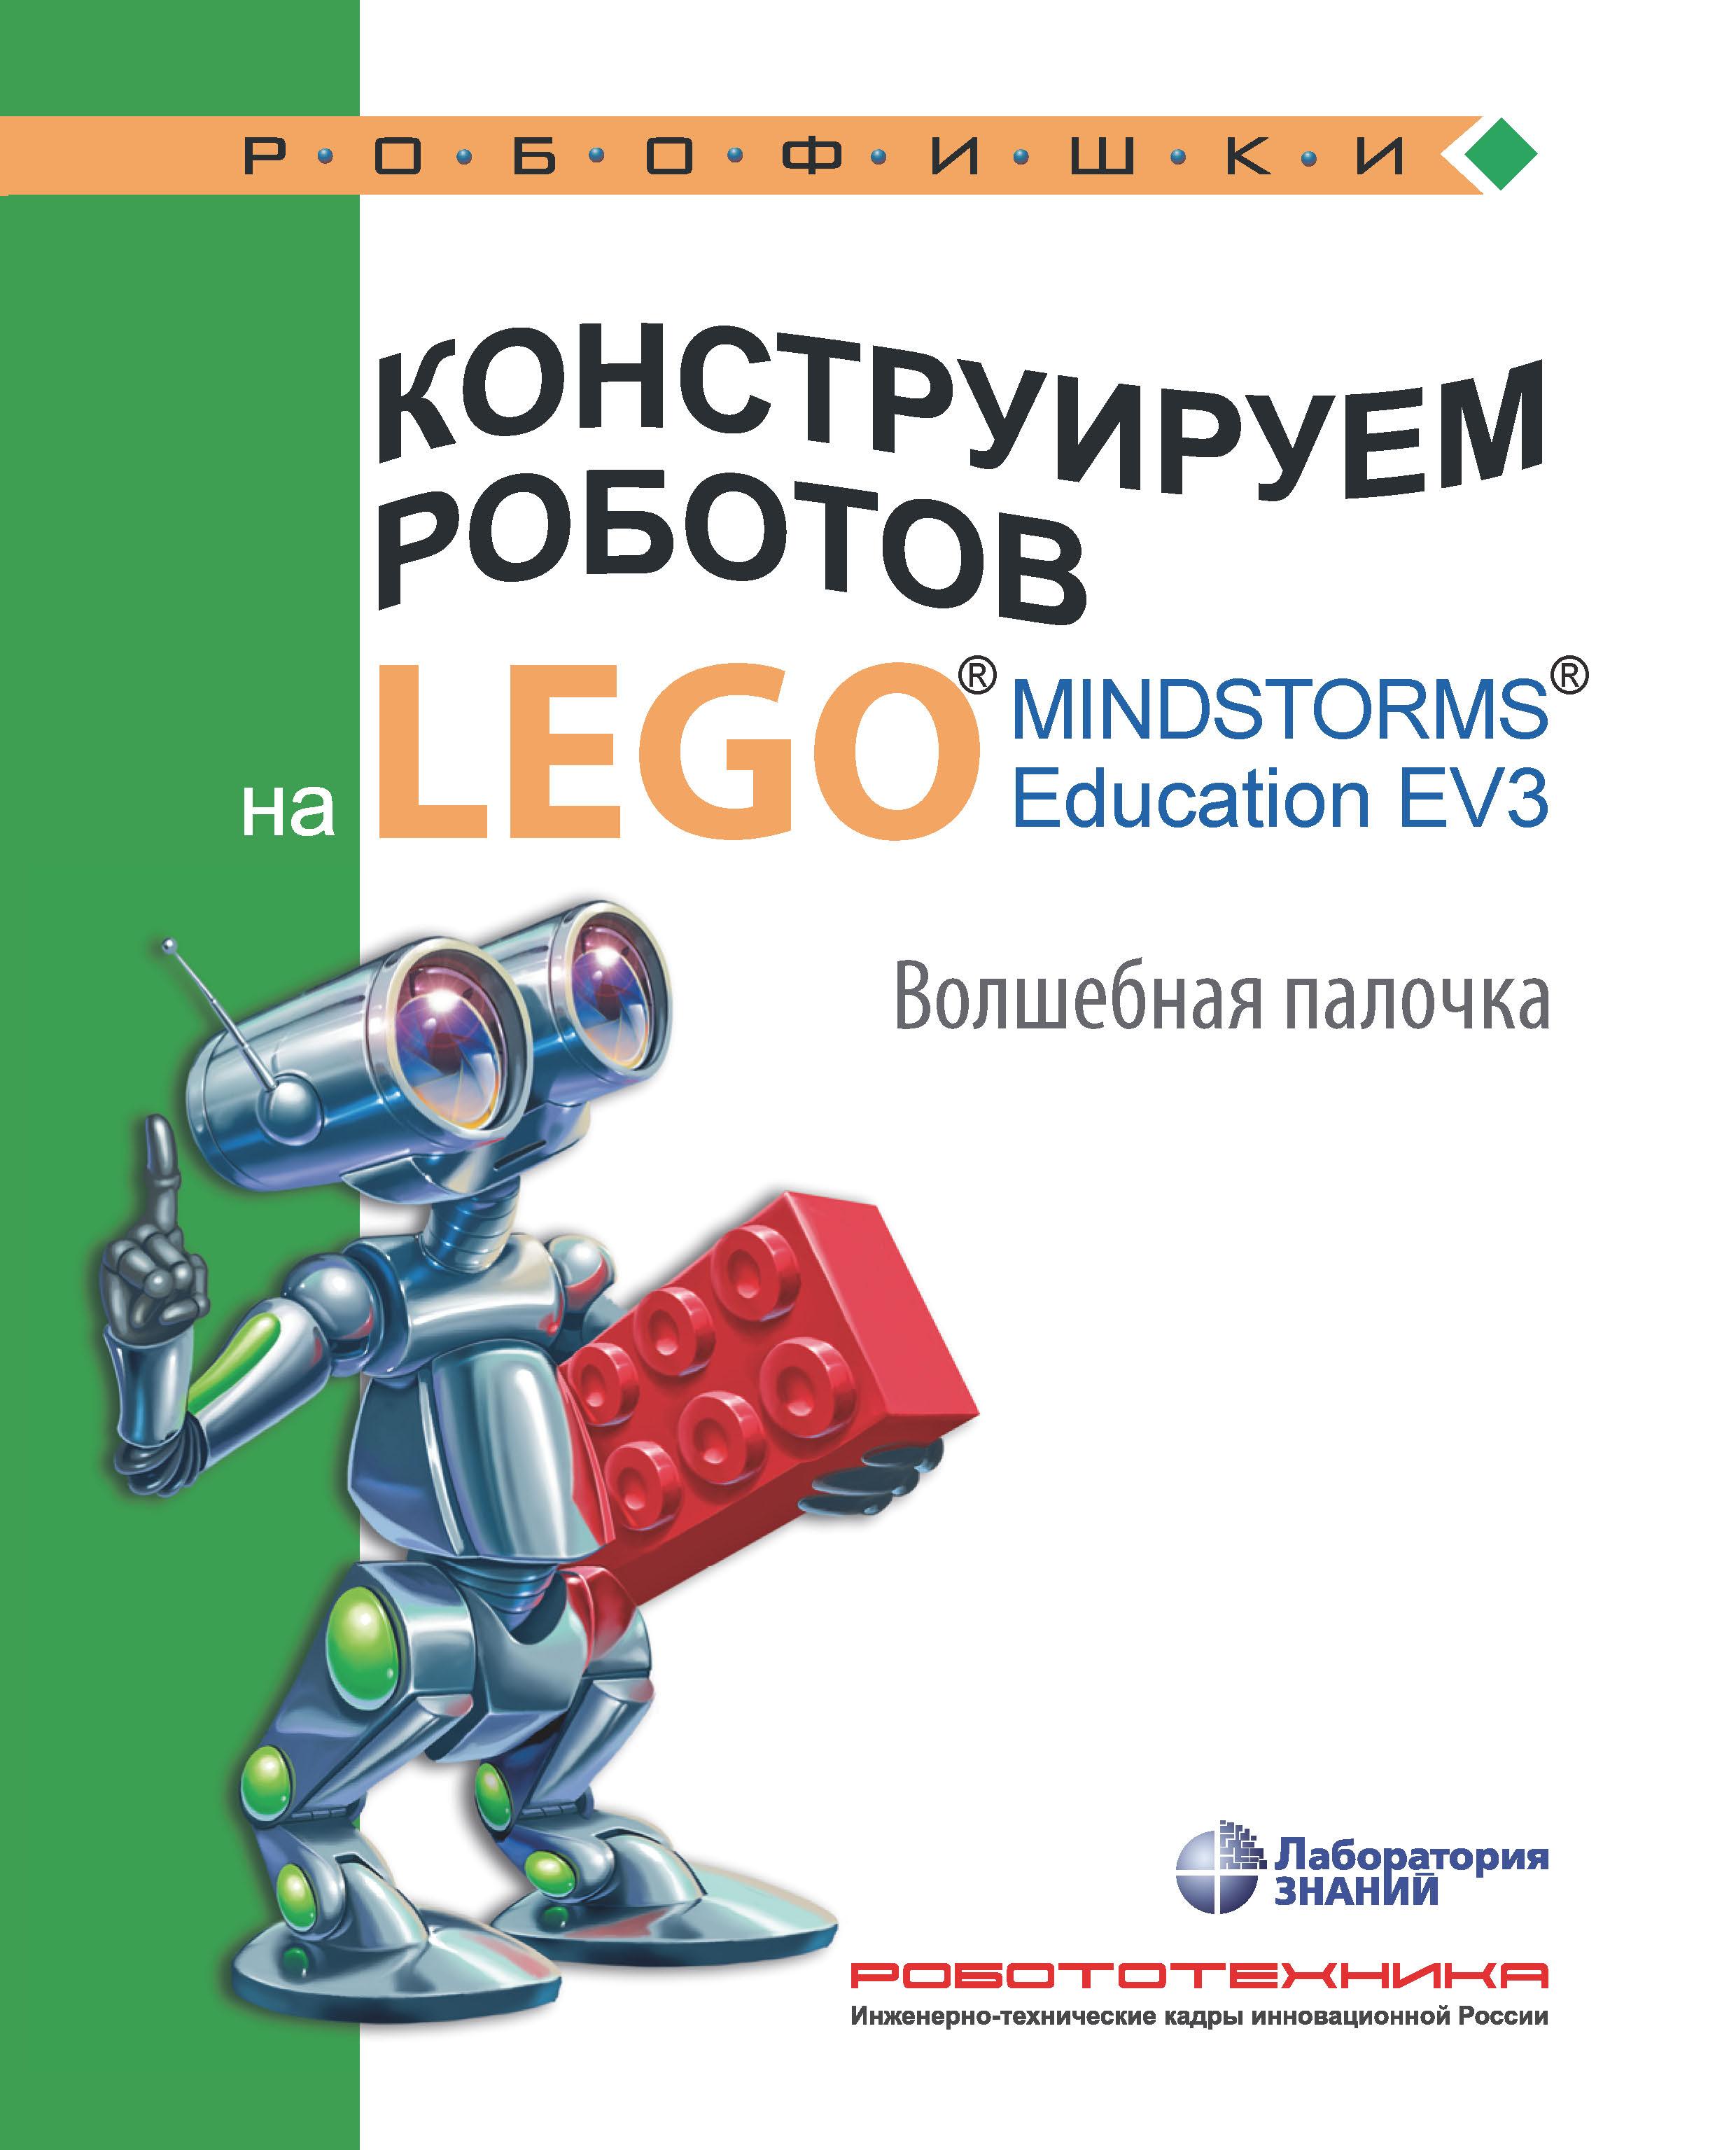 Фото - В. В. Тарапата Конструируем роботов на LEGO MINDSTORMS Education EV3. Волшебная палочка тарапата в конструируем роботов на lego education ev3 ханойская башня илл шкерин мробофишки тарапата